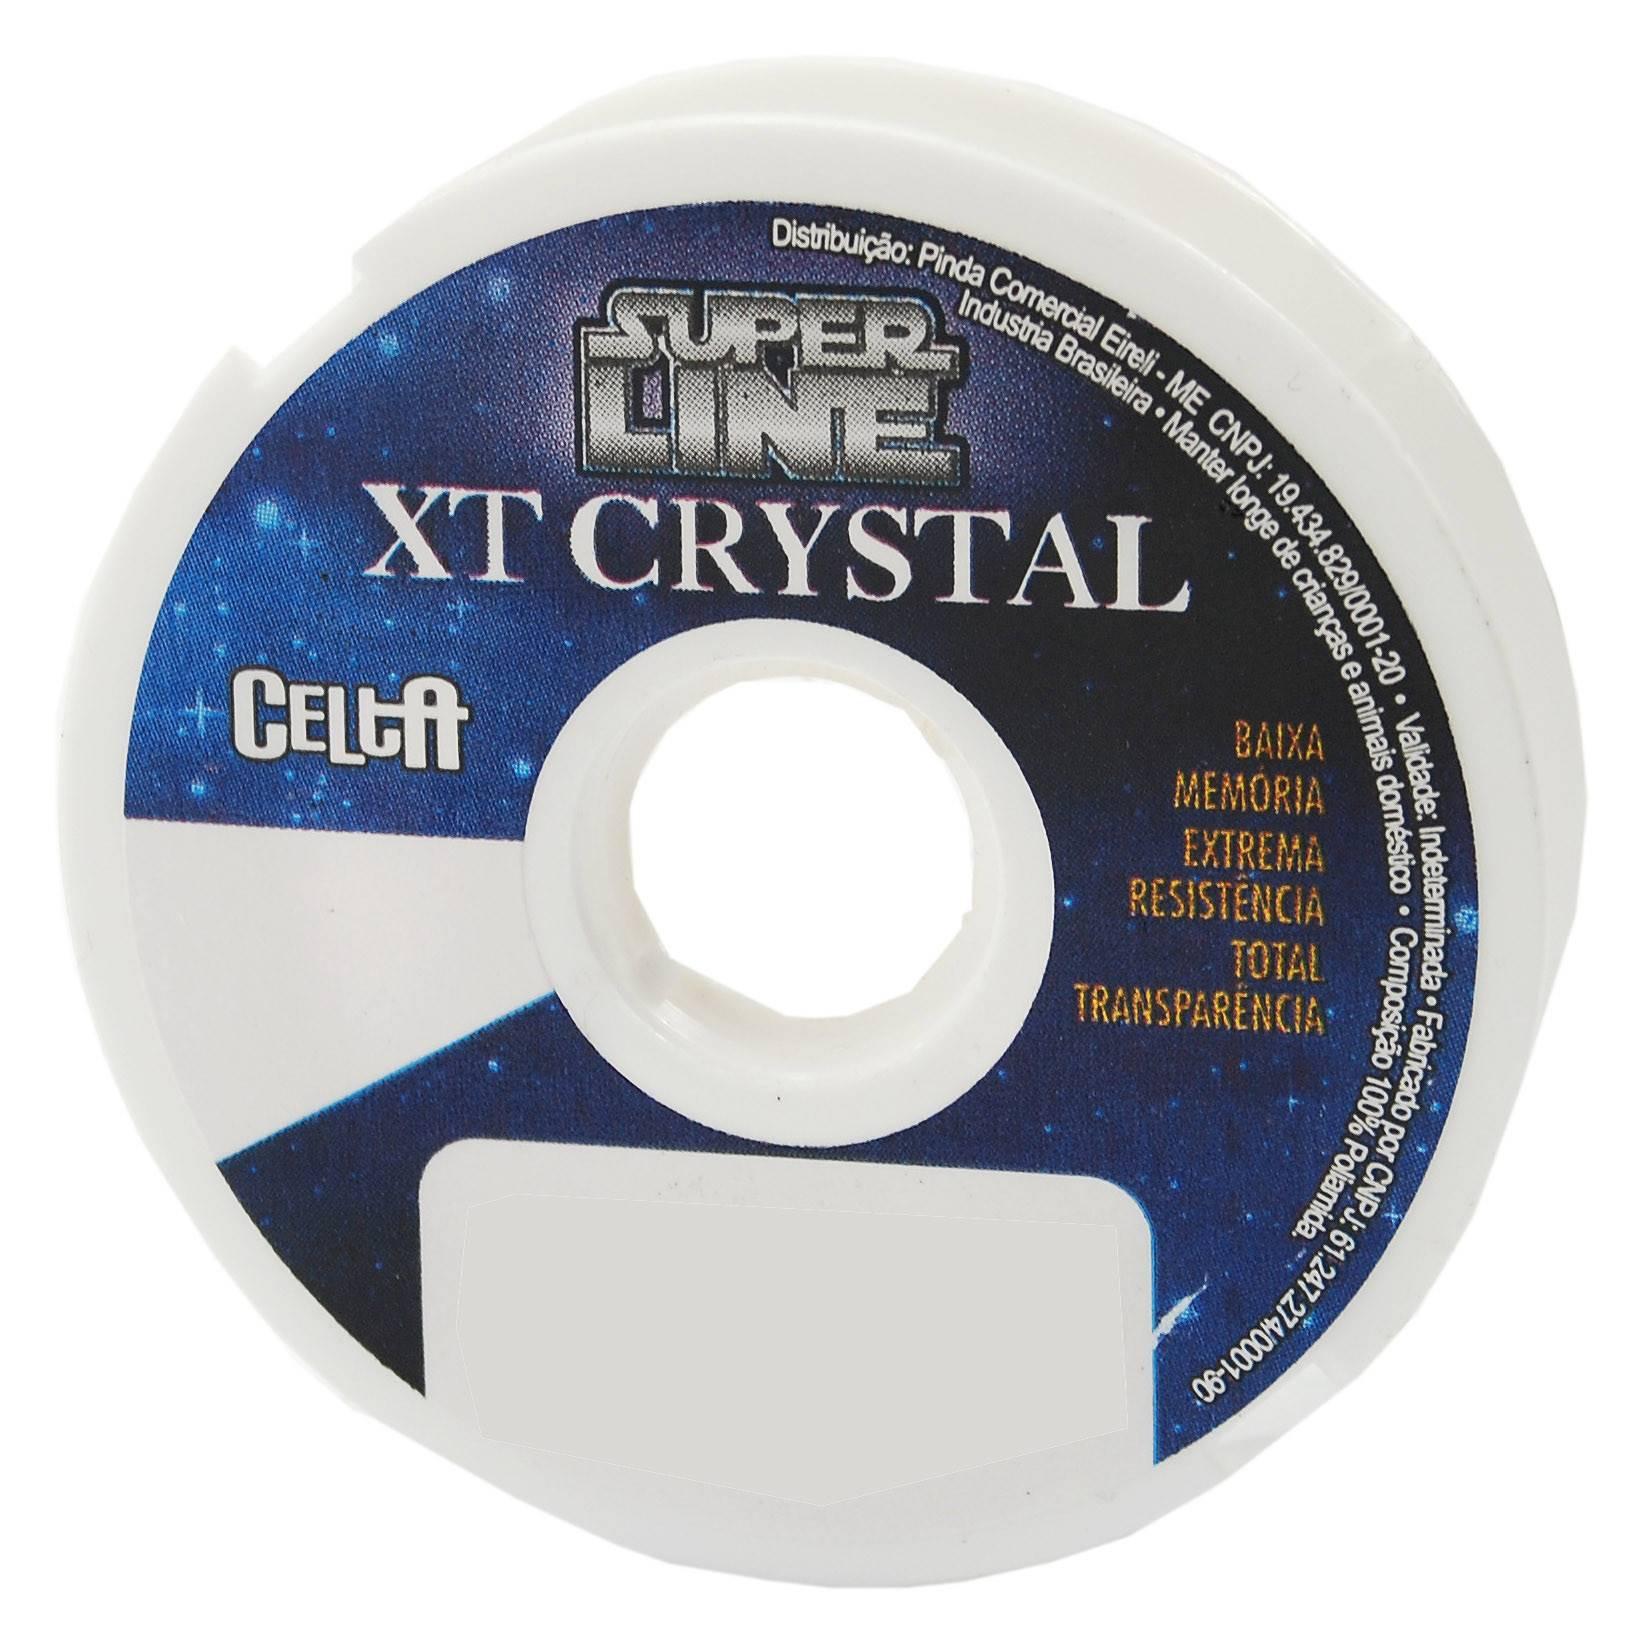 Linha Mono Celta XT Crystal e Titanium 0,40mm 24,7lbs/11,2kg - 120 Metros